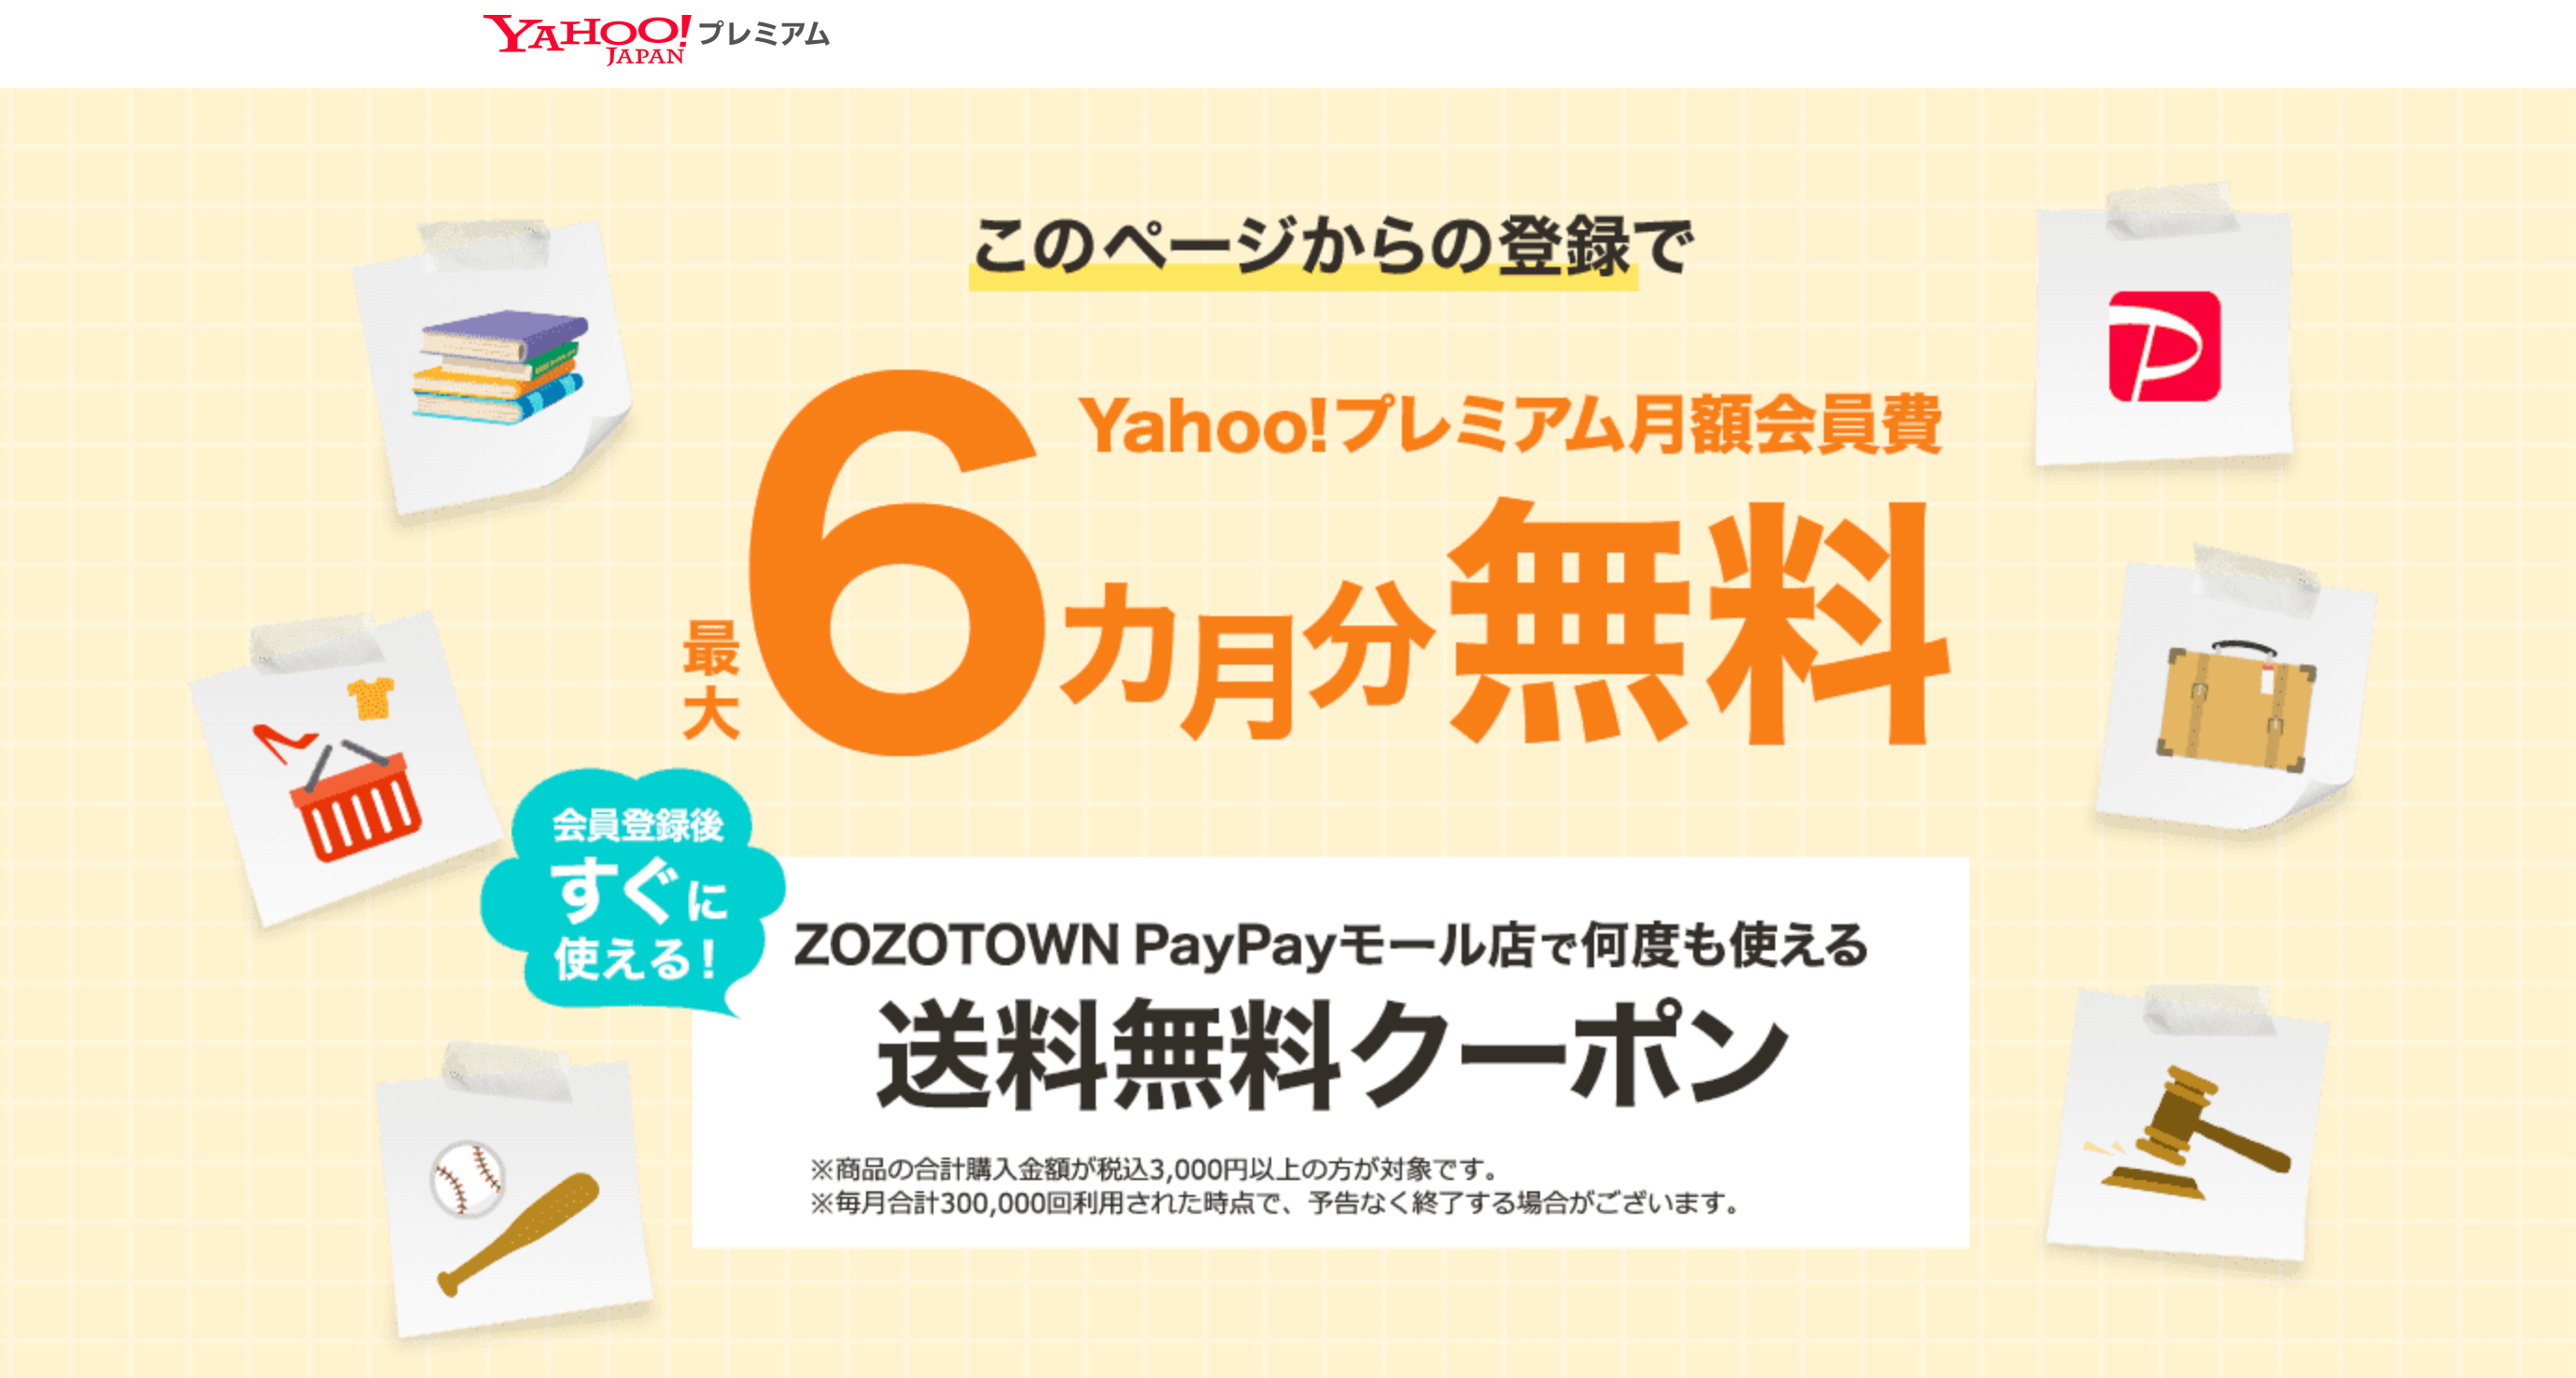 Yahoo!プレミアム会員の登録